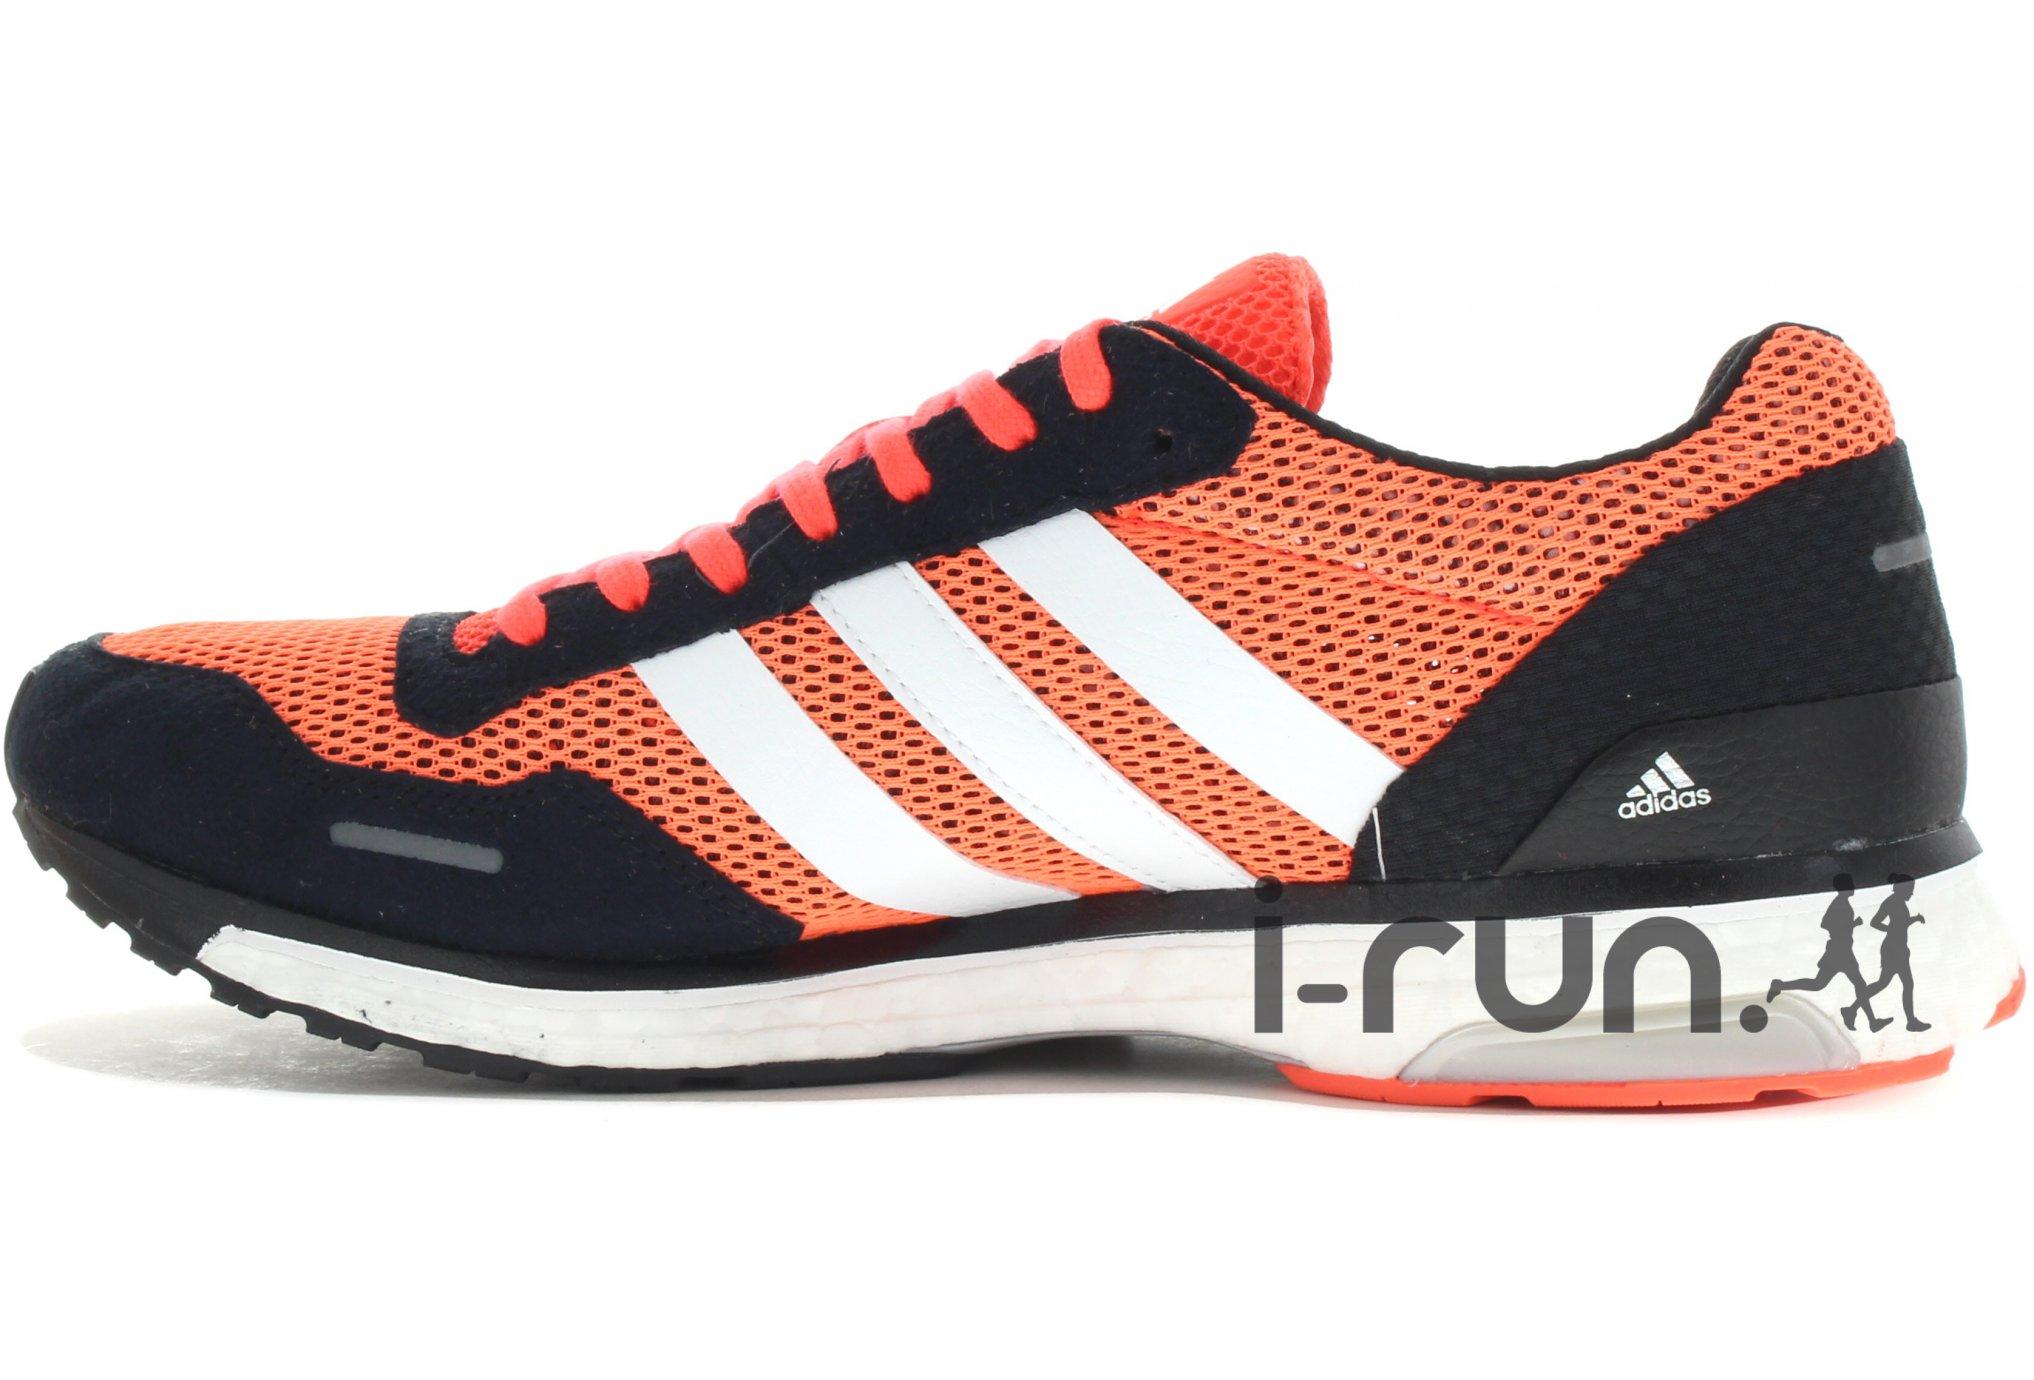 53cfd9398 ... adidas adizero adios boost 3 m chaussures homme 118201 1 sz